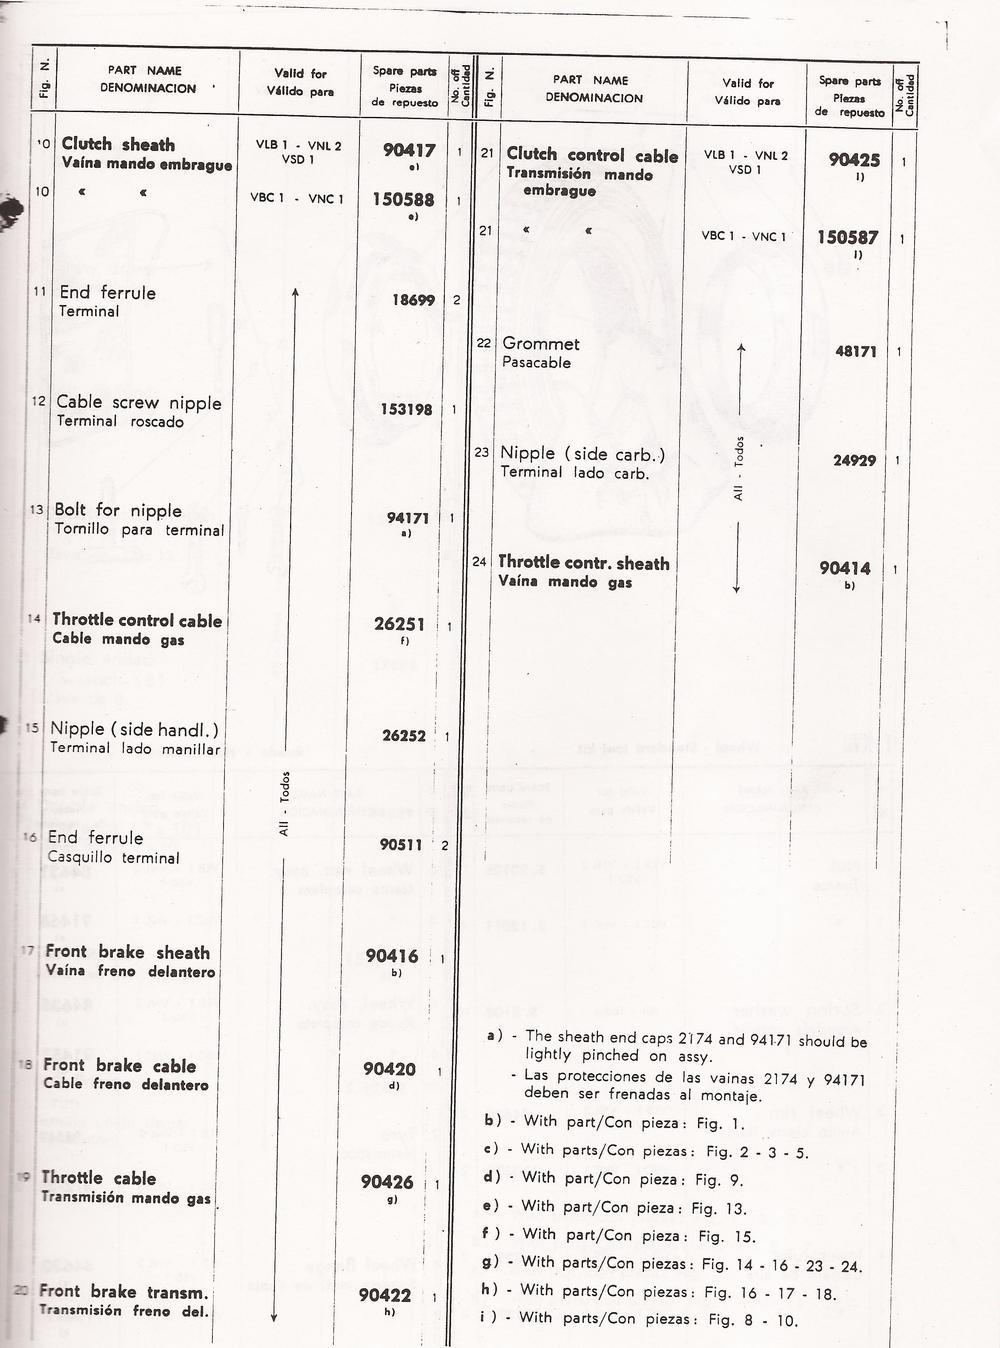 02-25-2013 vespa manaul 59.jpg